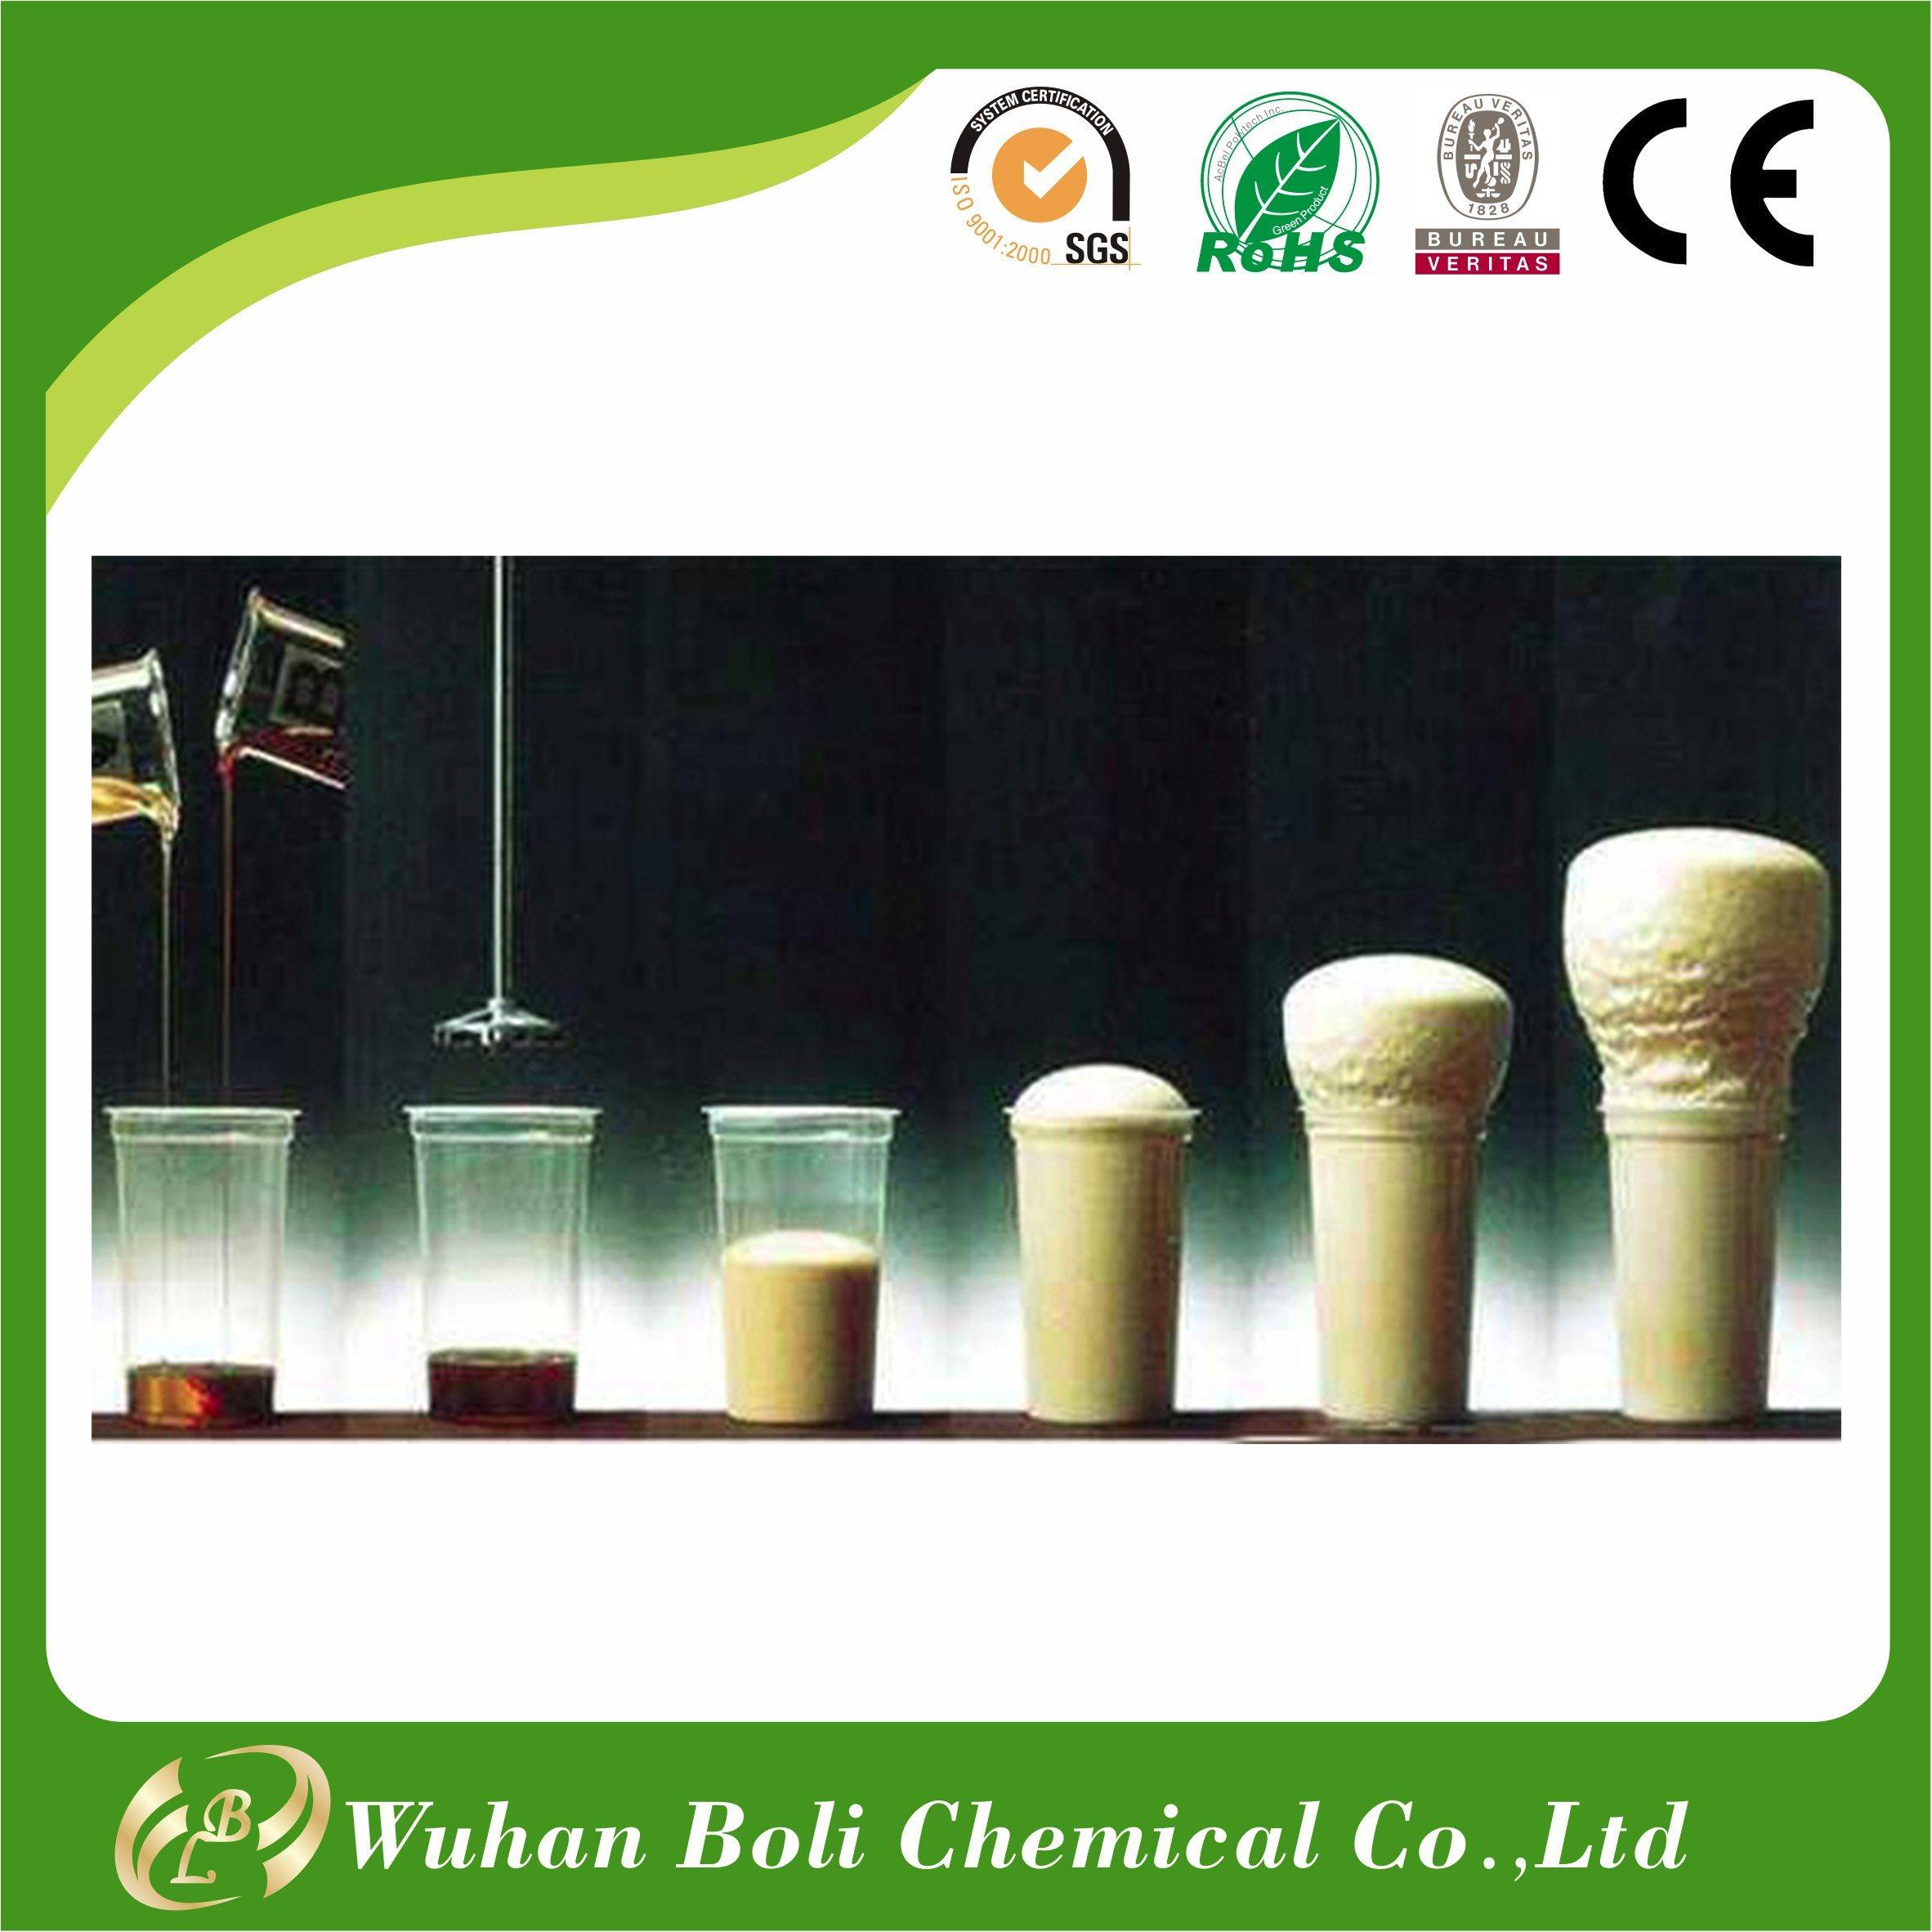 Super Adhesion Polyurethane Foam Adhesive PU Glue for EPS and Gi Sheet Attaching